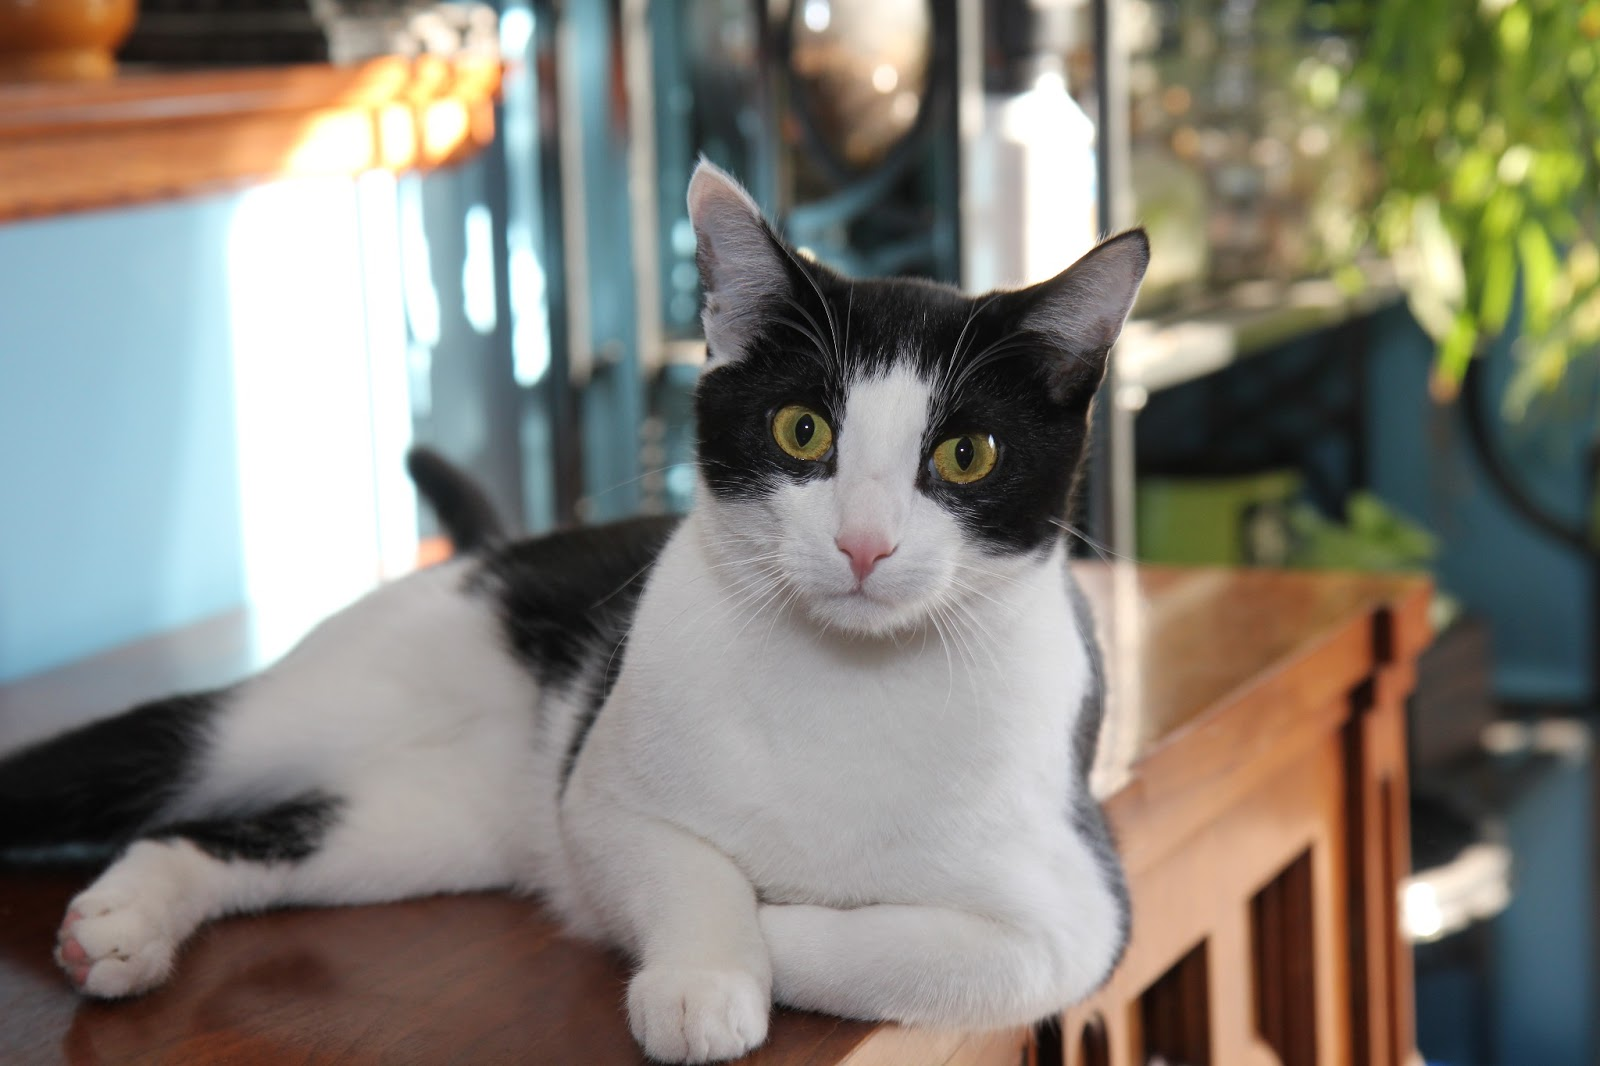 A relaxed tuxedo cat